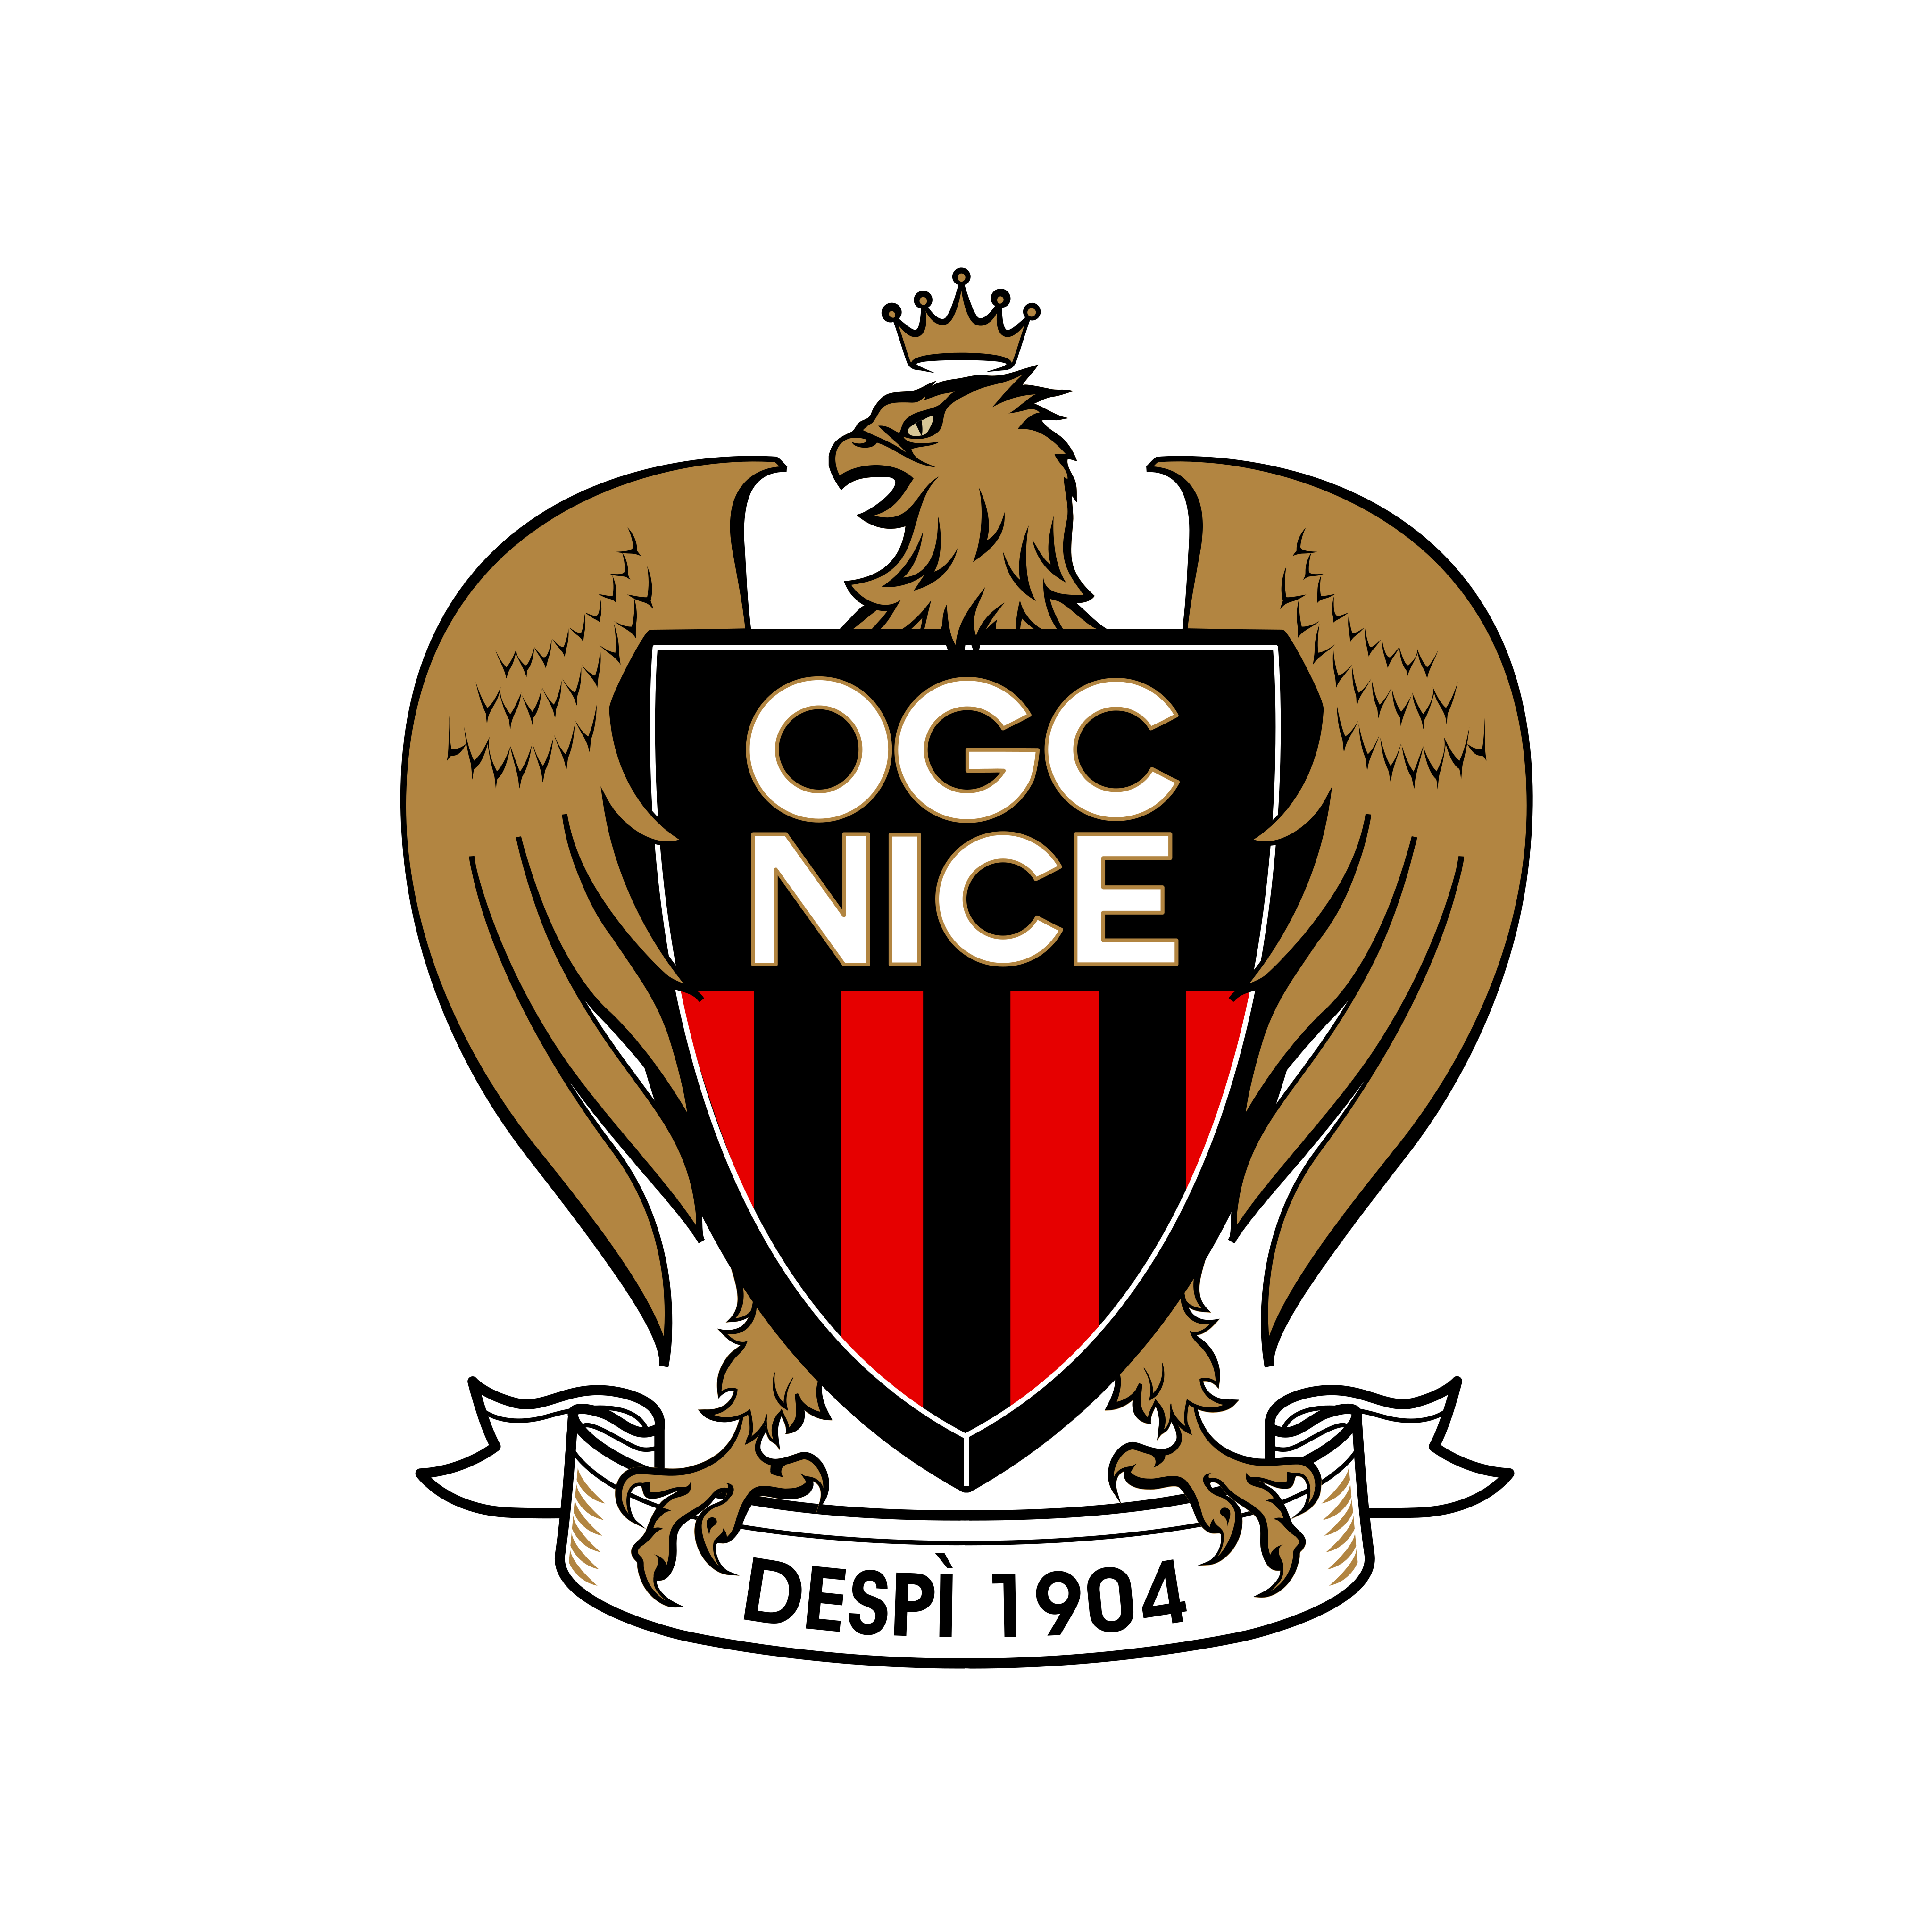 ogc nice logo 0 - OGC Nice Logo